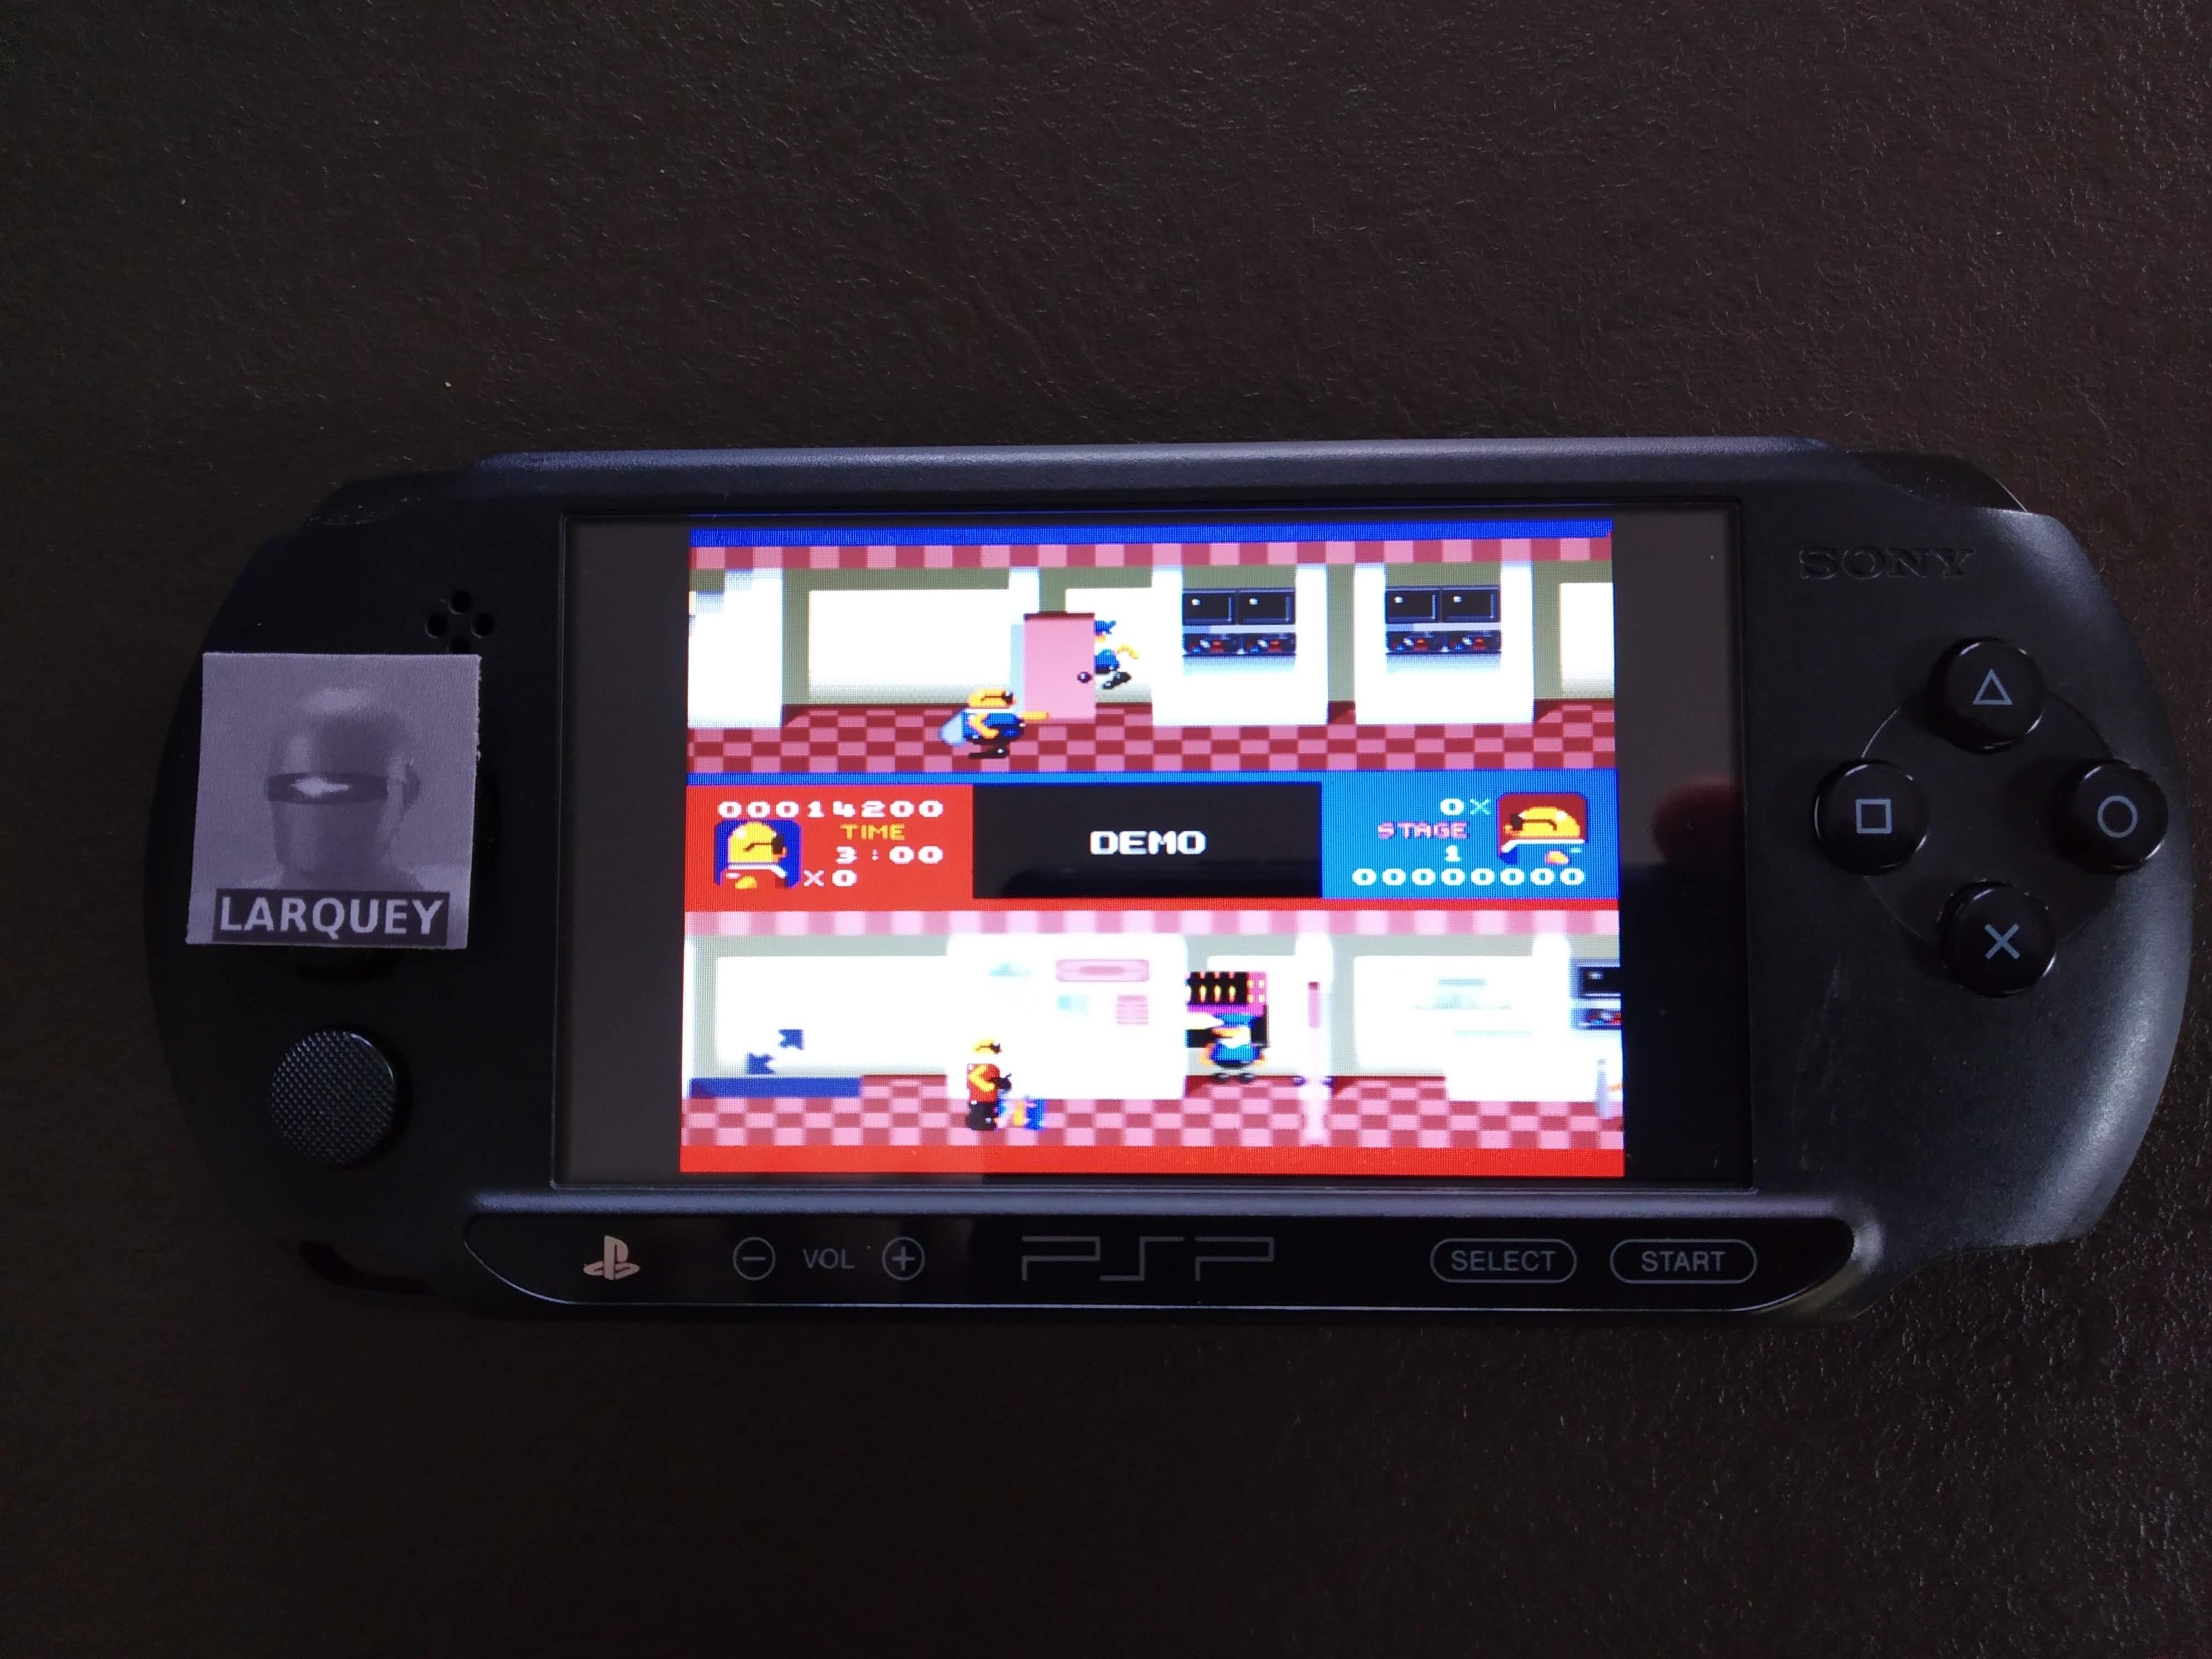 Larquey: Sega Genesis/Mega Drive Collection: Bonanza Bros. [Hard] (PSP) 14,200 points on 2019-12-27 02:34:43